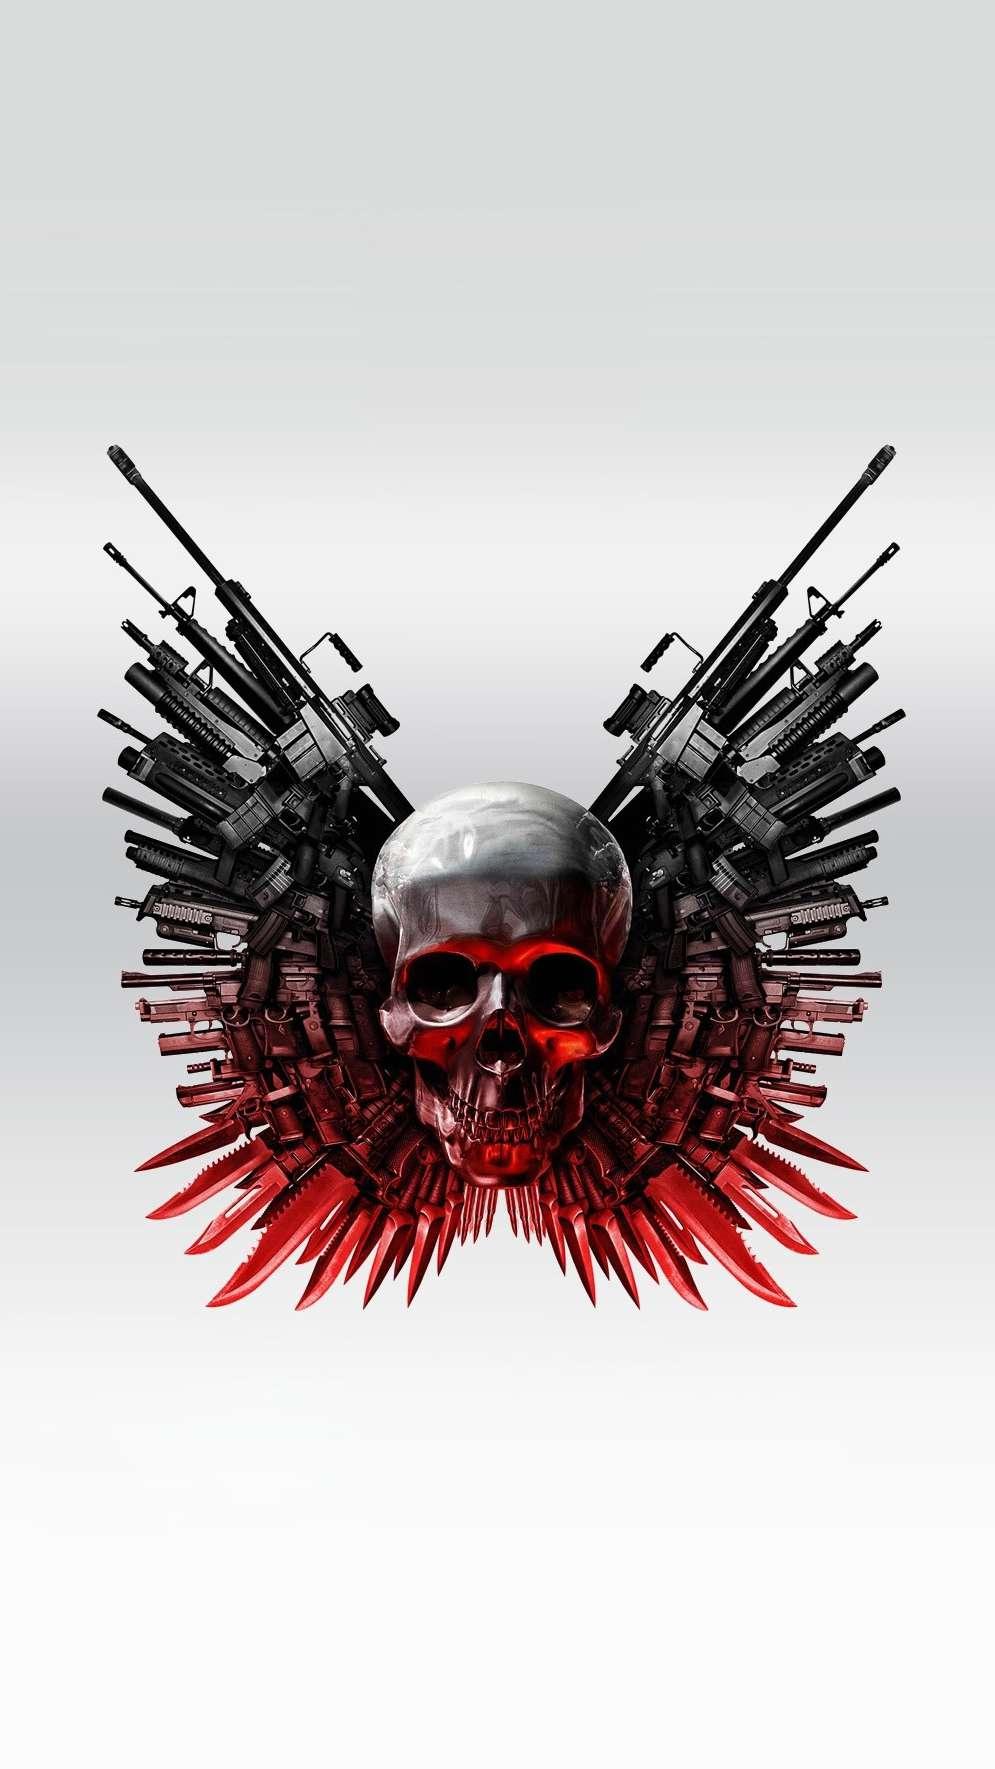 Guns and Skulls iPhone Wallpaper